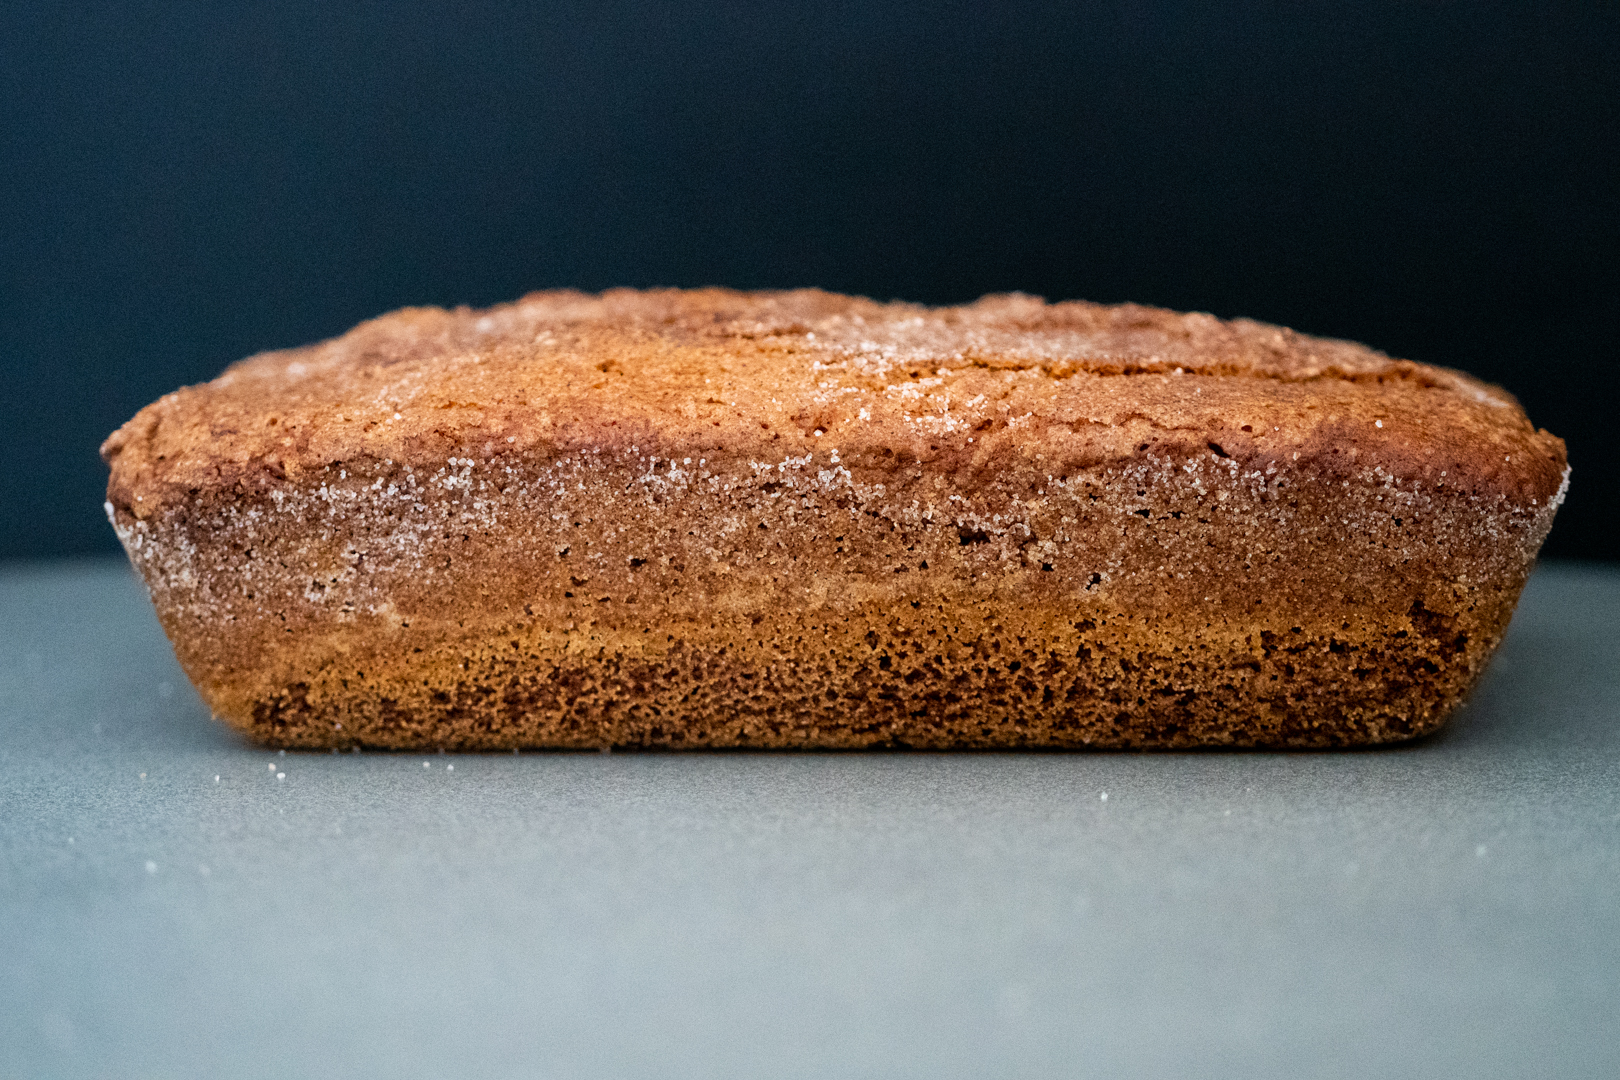 Making Bread - Amish Friendship Bread